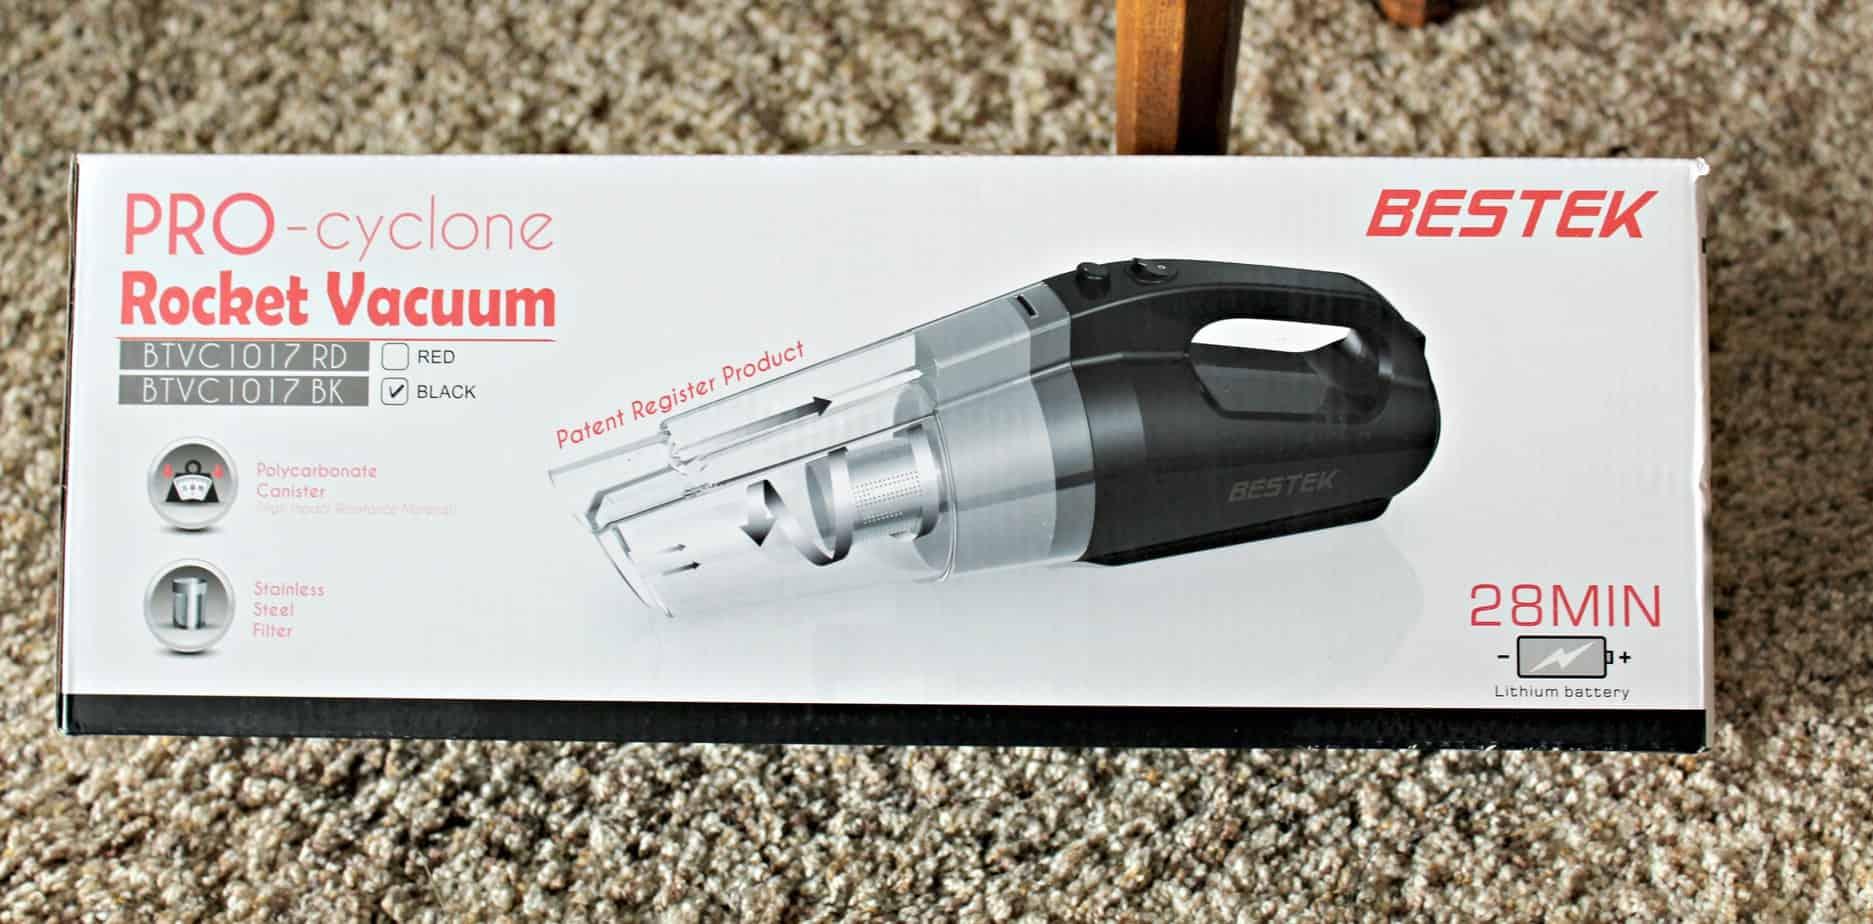 BESTEK Pro- Cyclone Rocket Cordless Stick Vacuum Cleaner